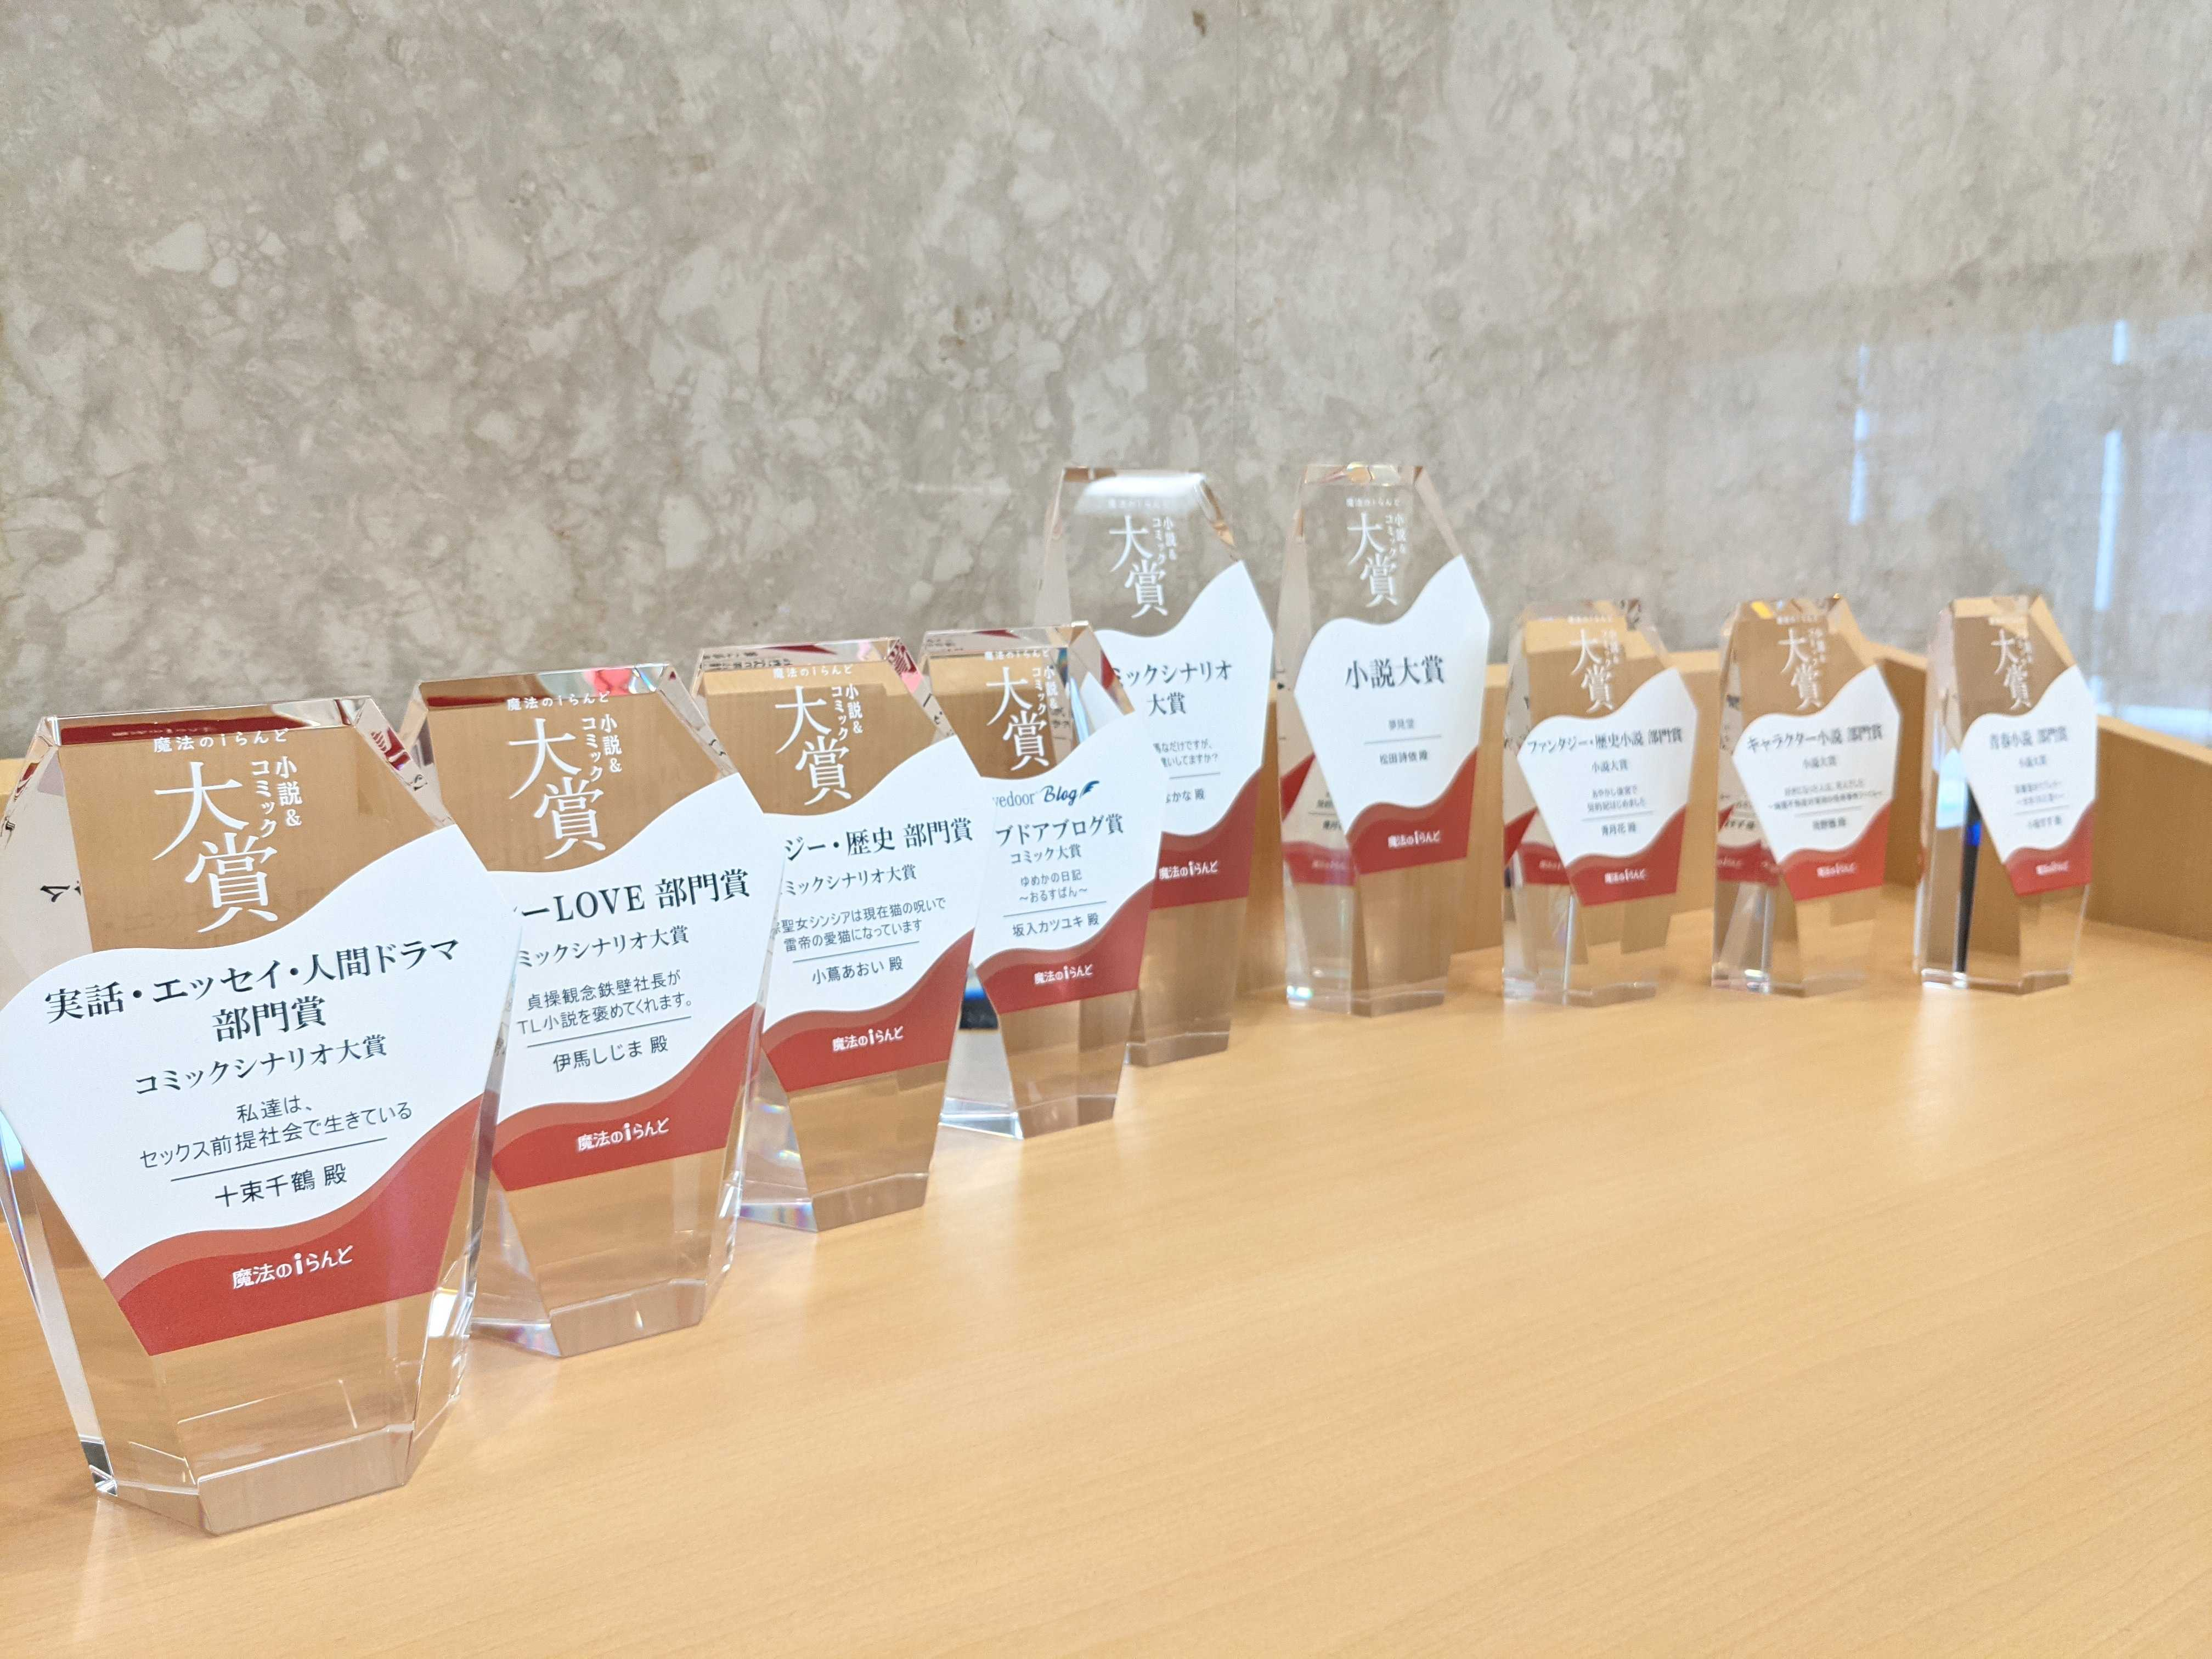 https://storage.googleapis.com/blog-info/entry/2021/06/maho_award.jpg